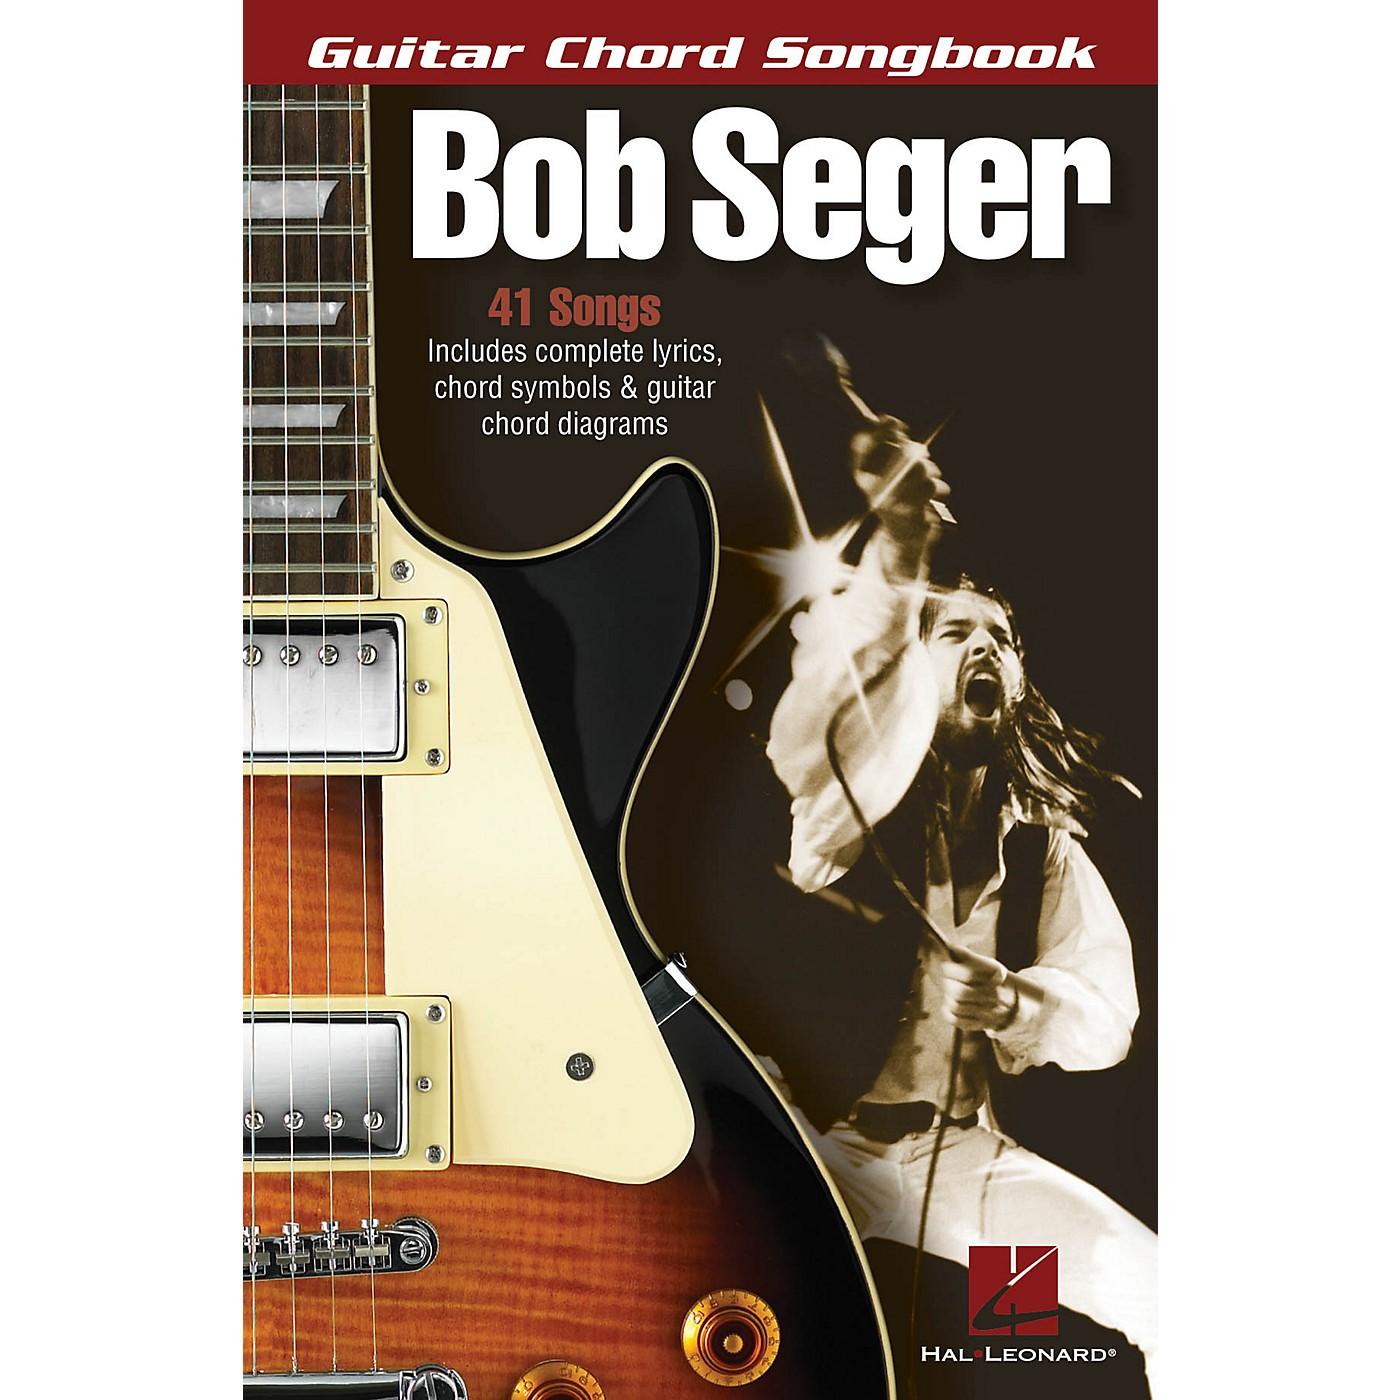 Hal Leonard Bob Seger - Guitar Chord Songbook Guitar Chord Songbook Series Softcover Performed by Bob Seger thumbnail